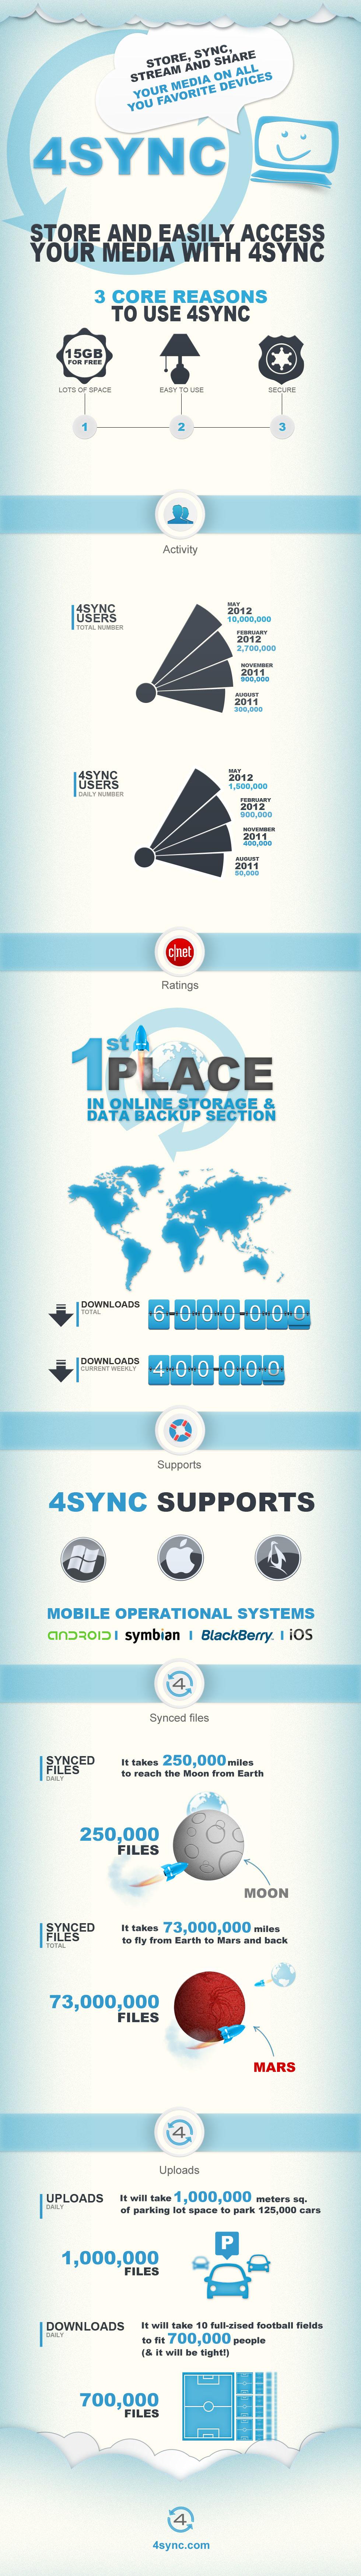 4sync-infographic